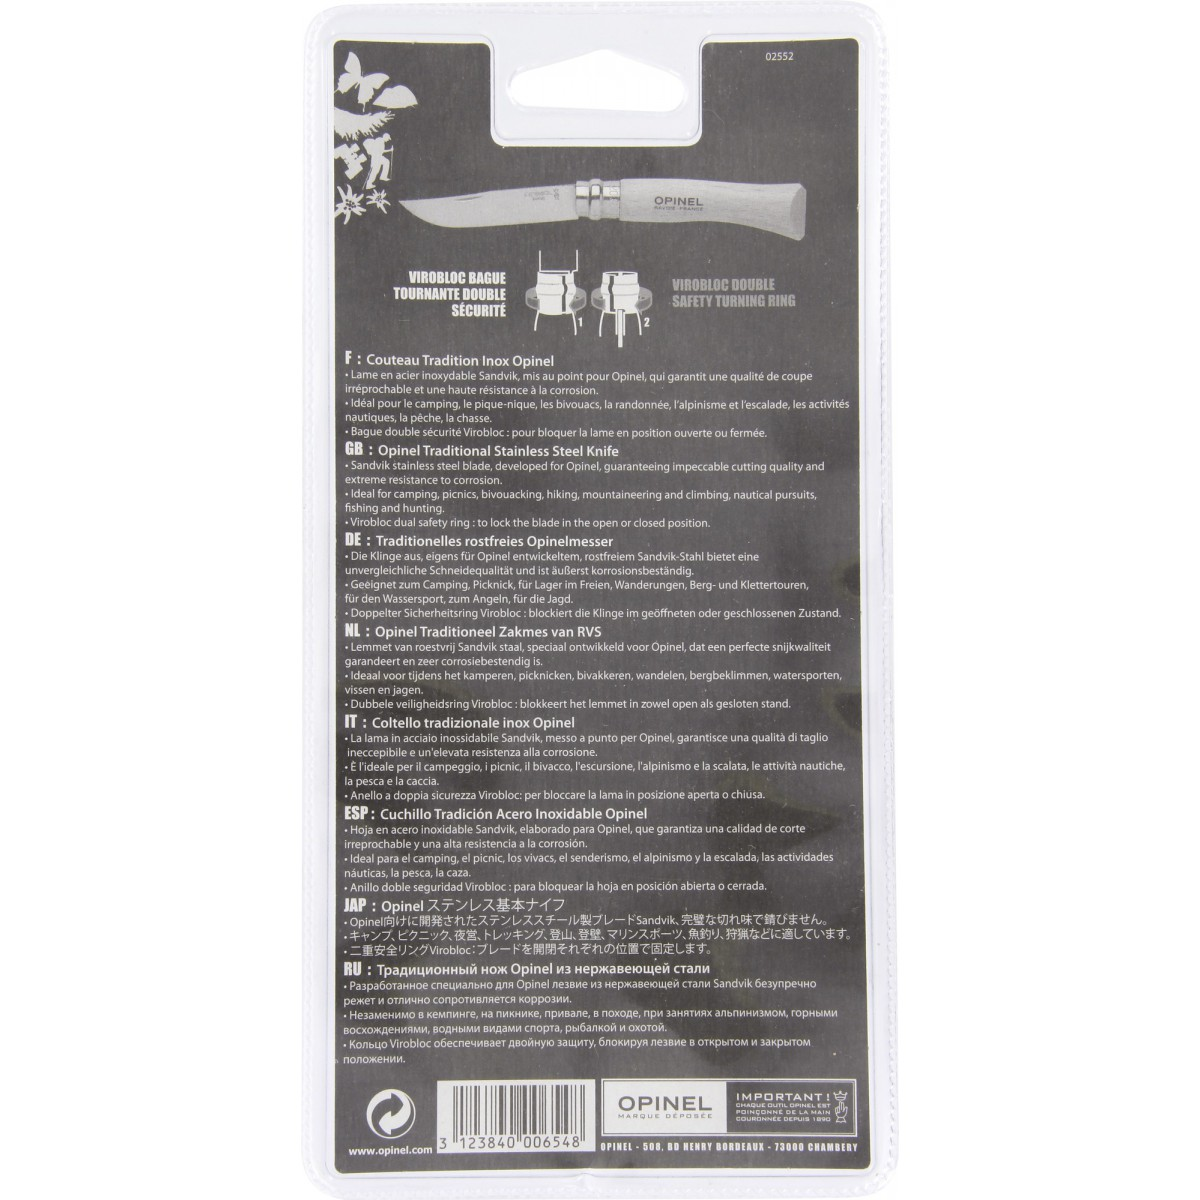 Couteau lame inox Opinel - Longueur lame 8 cm - N°7